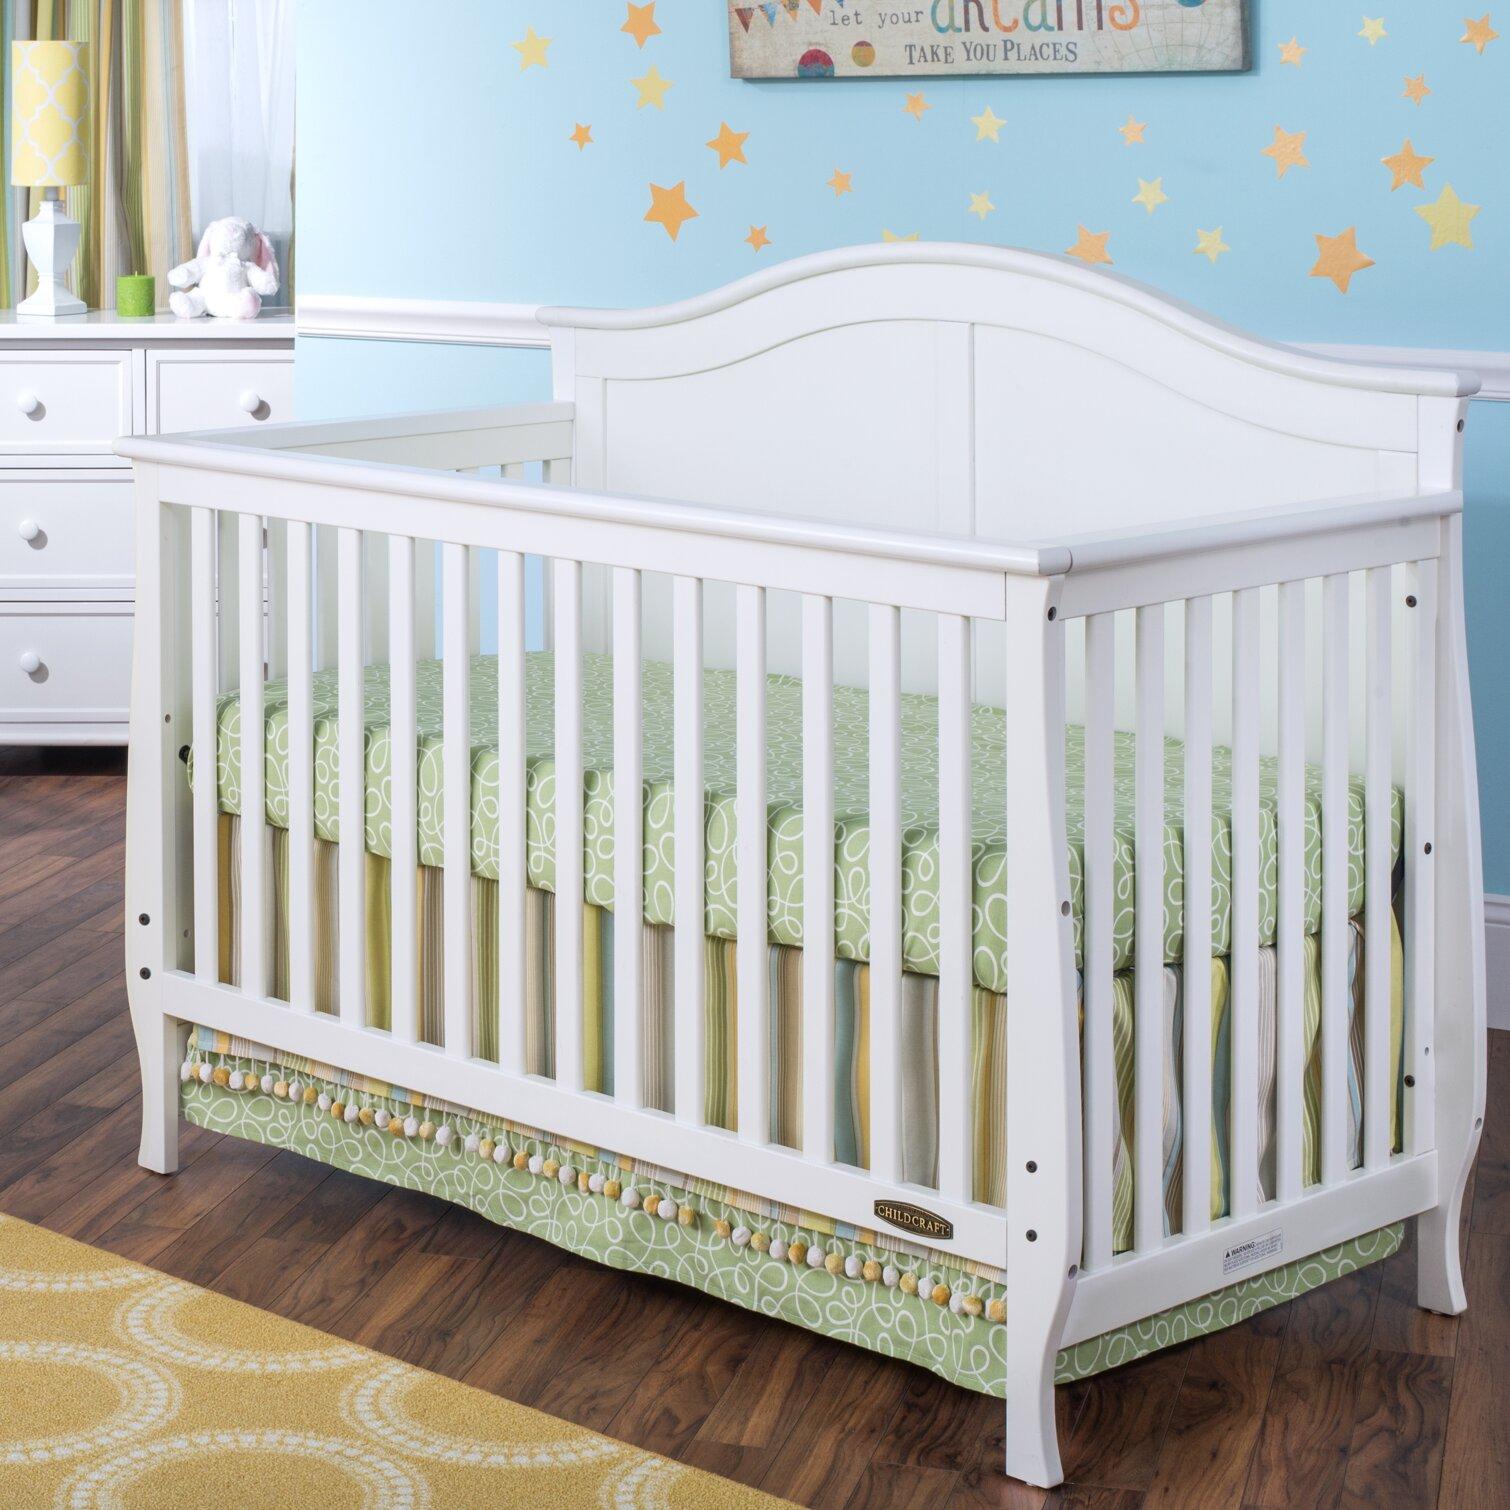 child craft camden 4 in 1 convertible crib reviews wayfair. Black Bedroom Furniture Sets. Home Design Ideas